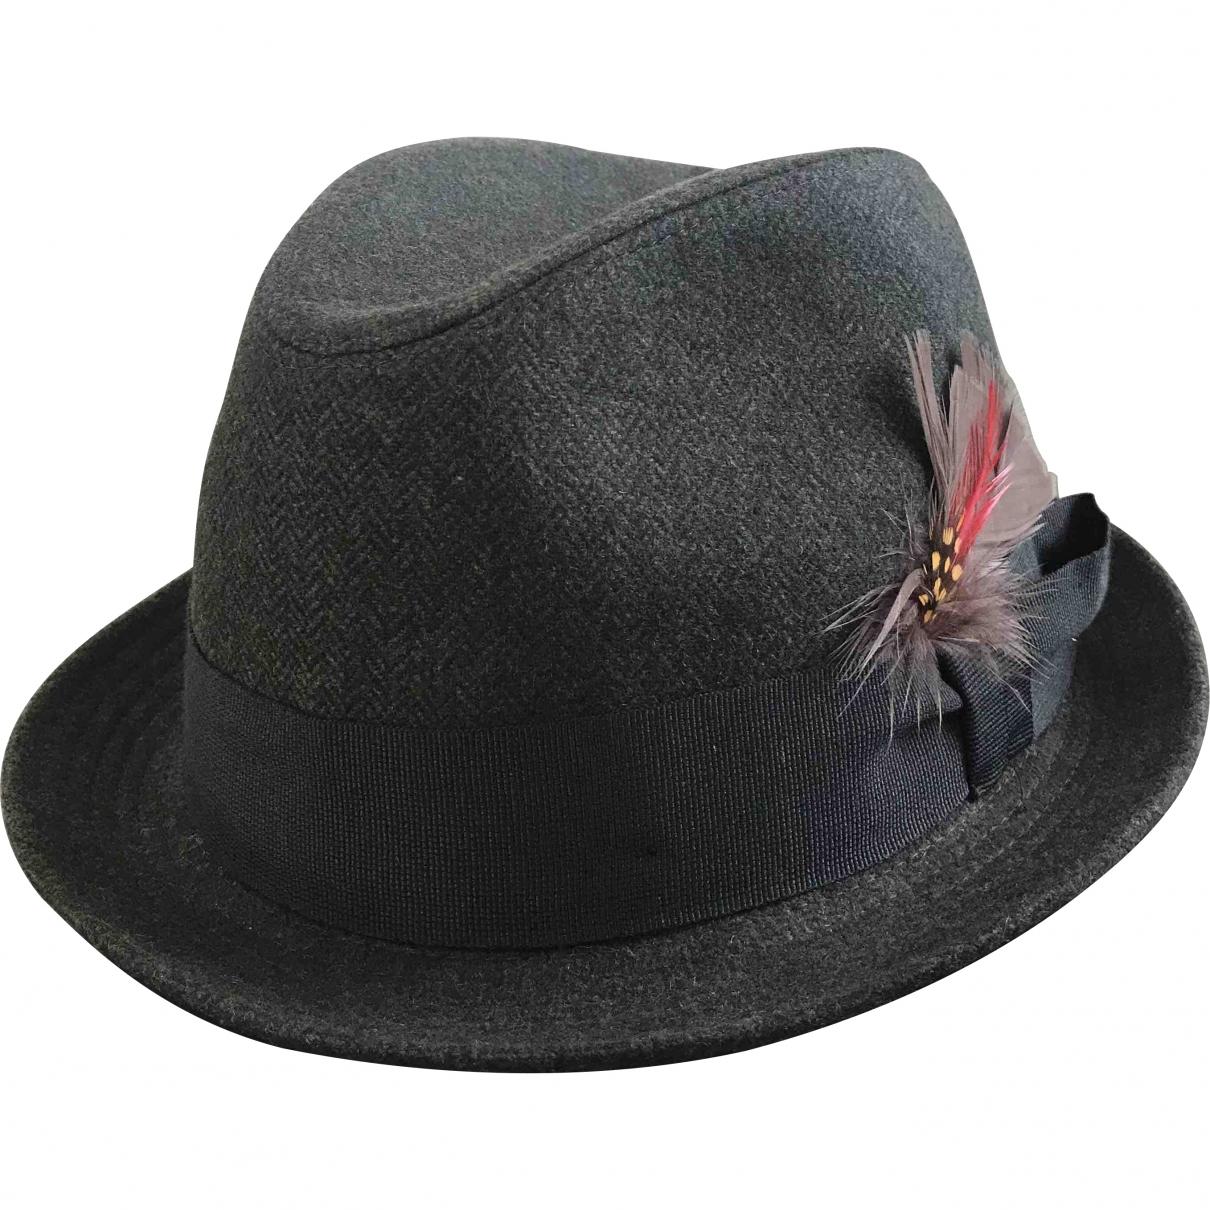 Paul Smith \N Khaki Wool hat & pull on hat for Men L International